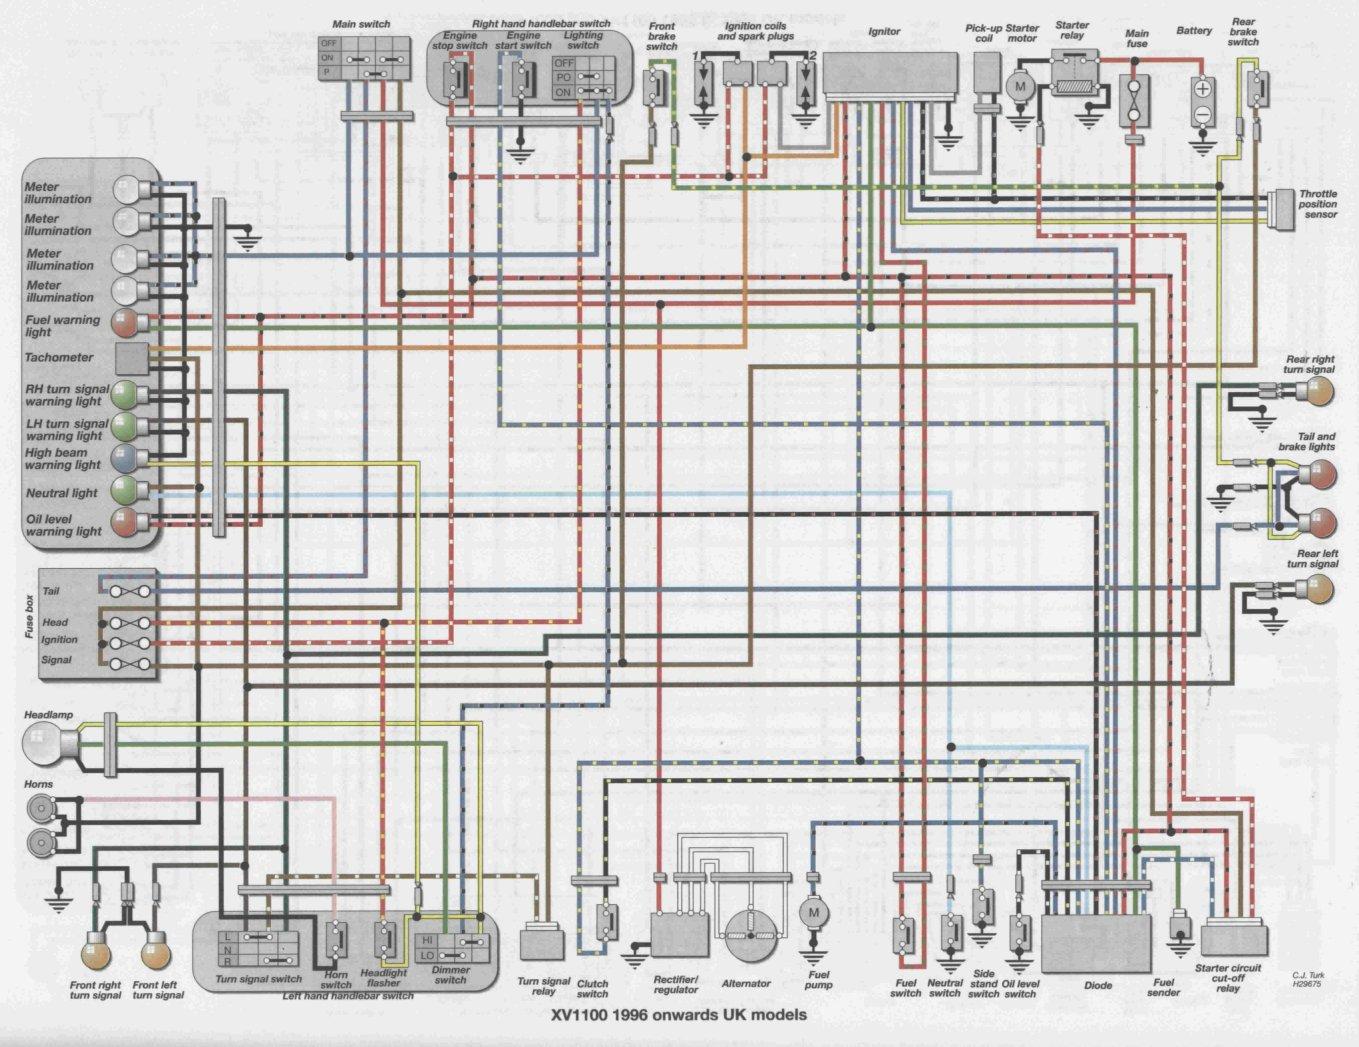 king quad 300 wiring diagram king quad 300 parts wiring